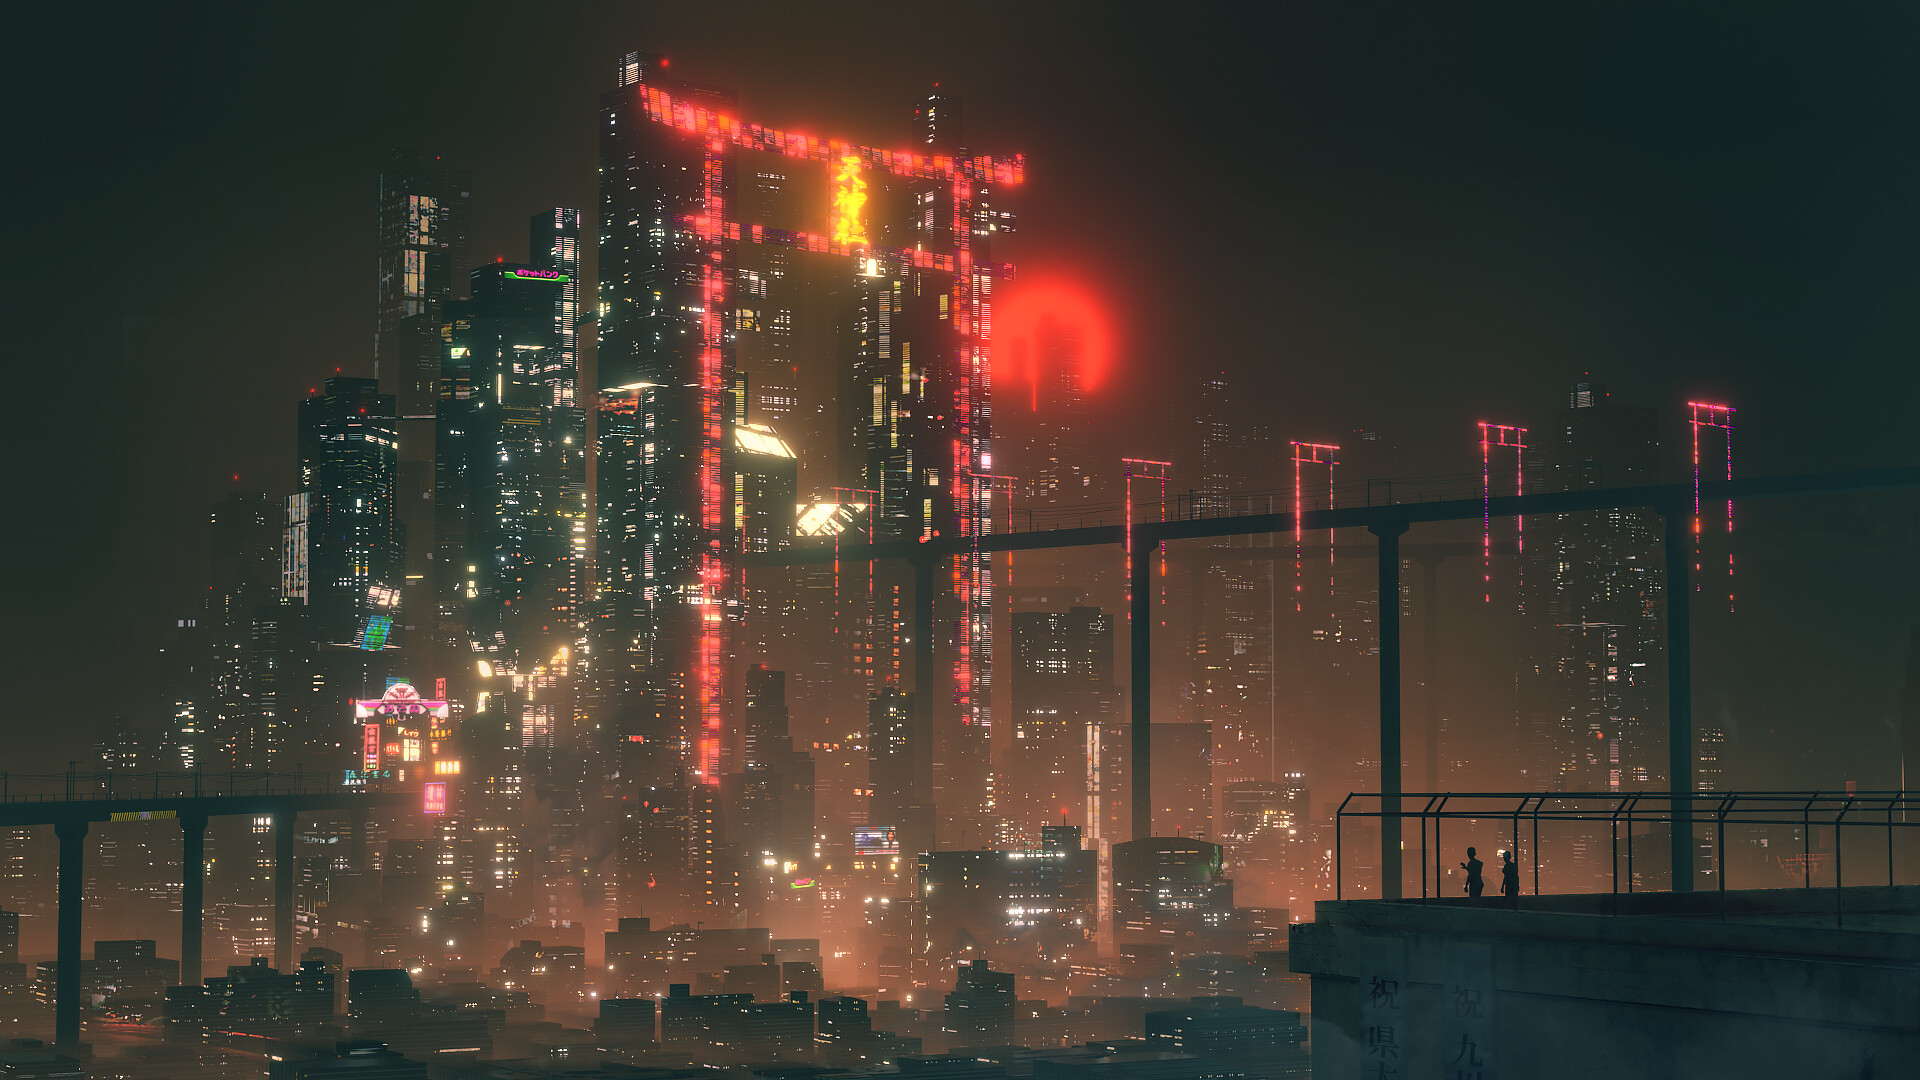 Cyberpunk Cityscape Hologram Night 1920x1080